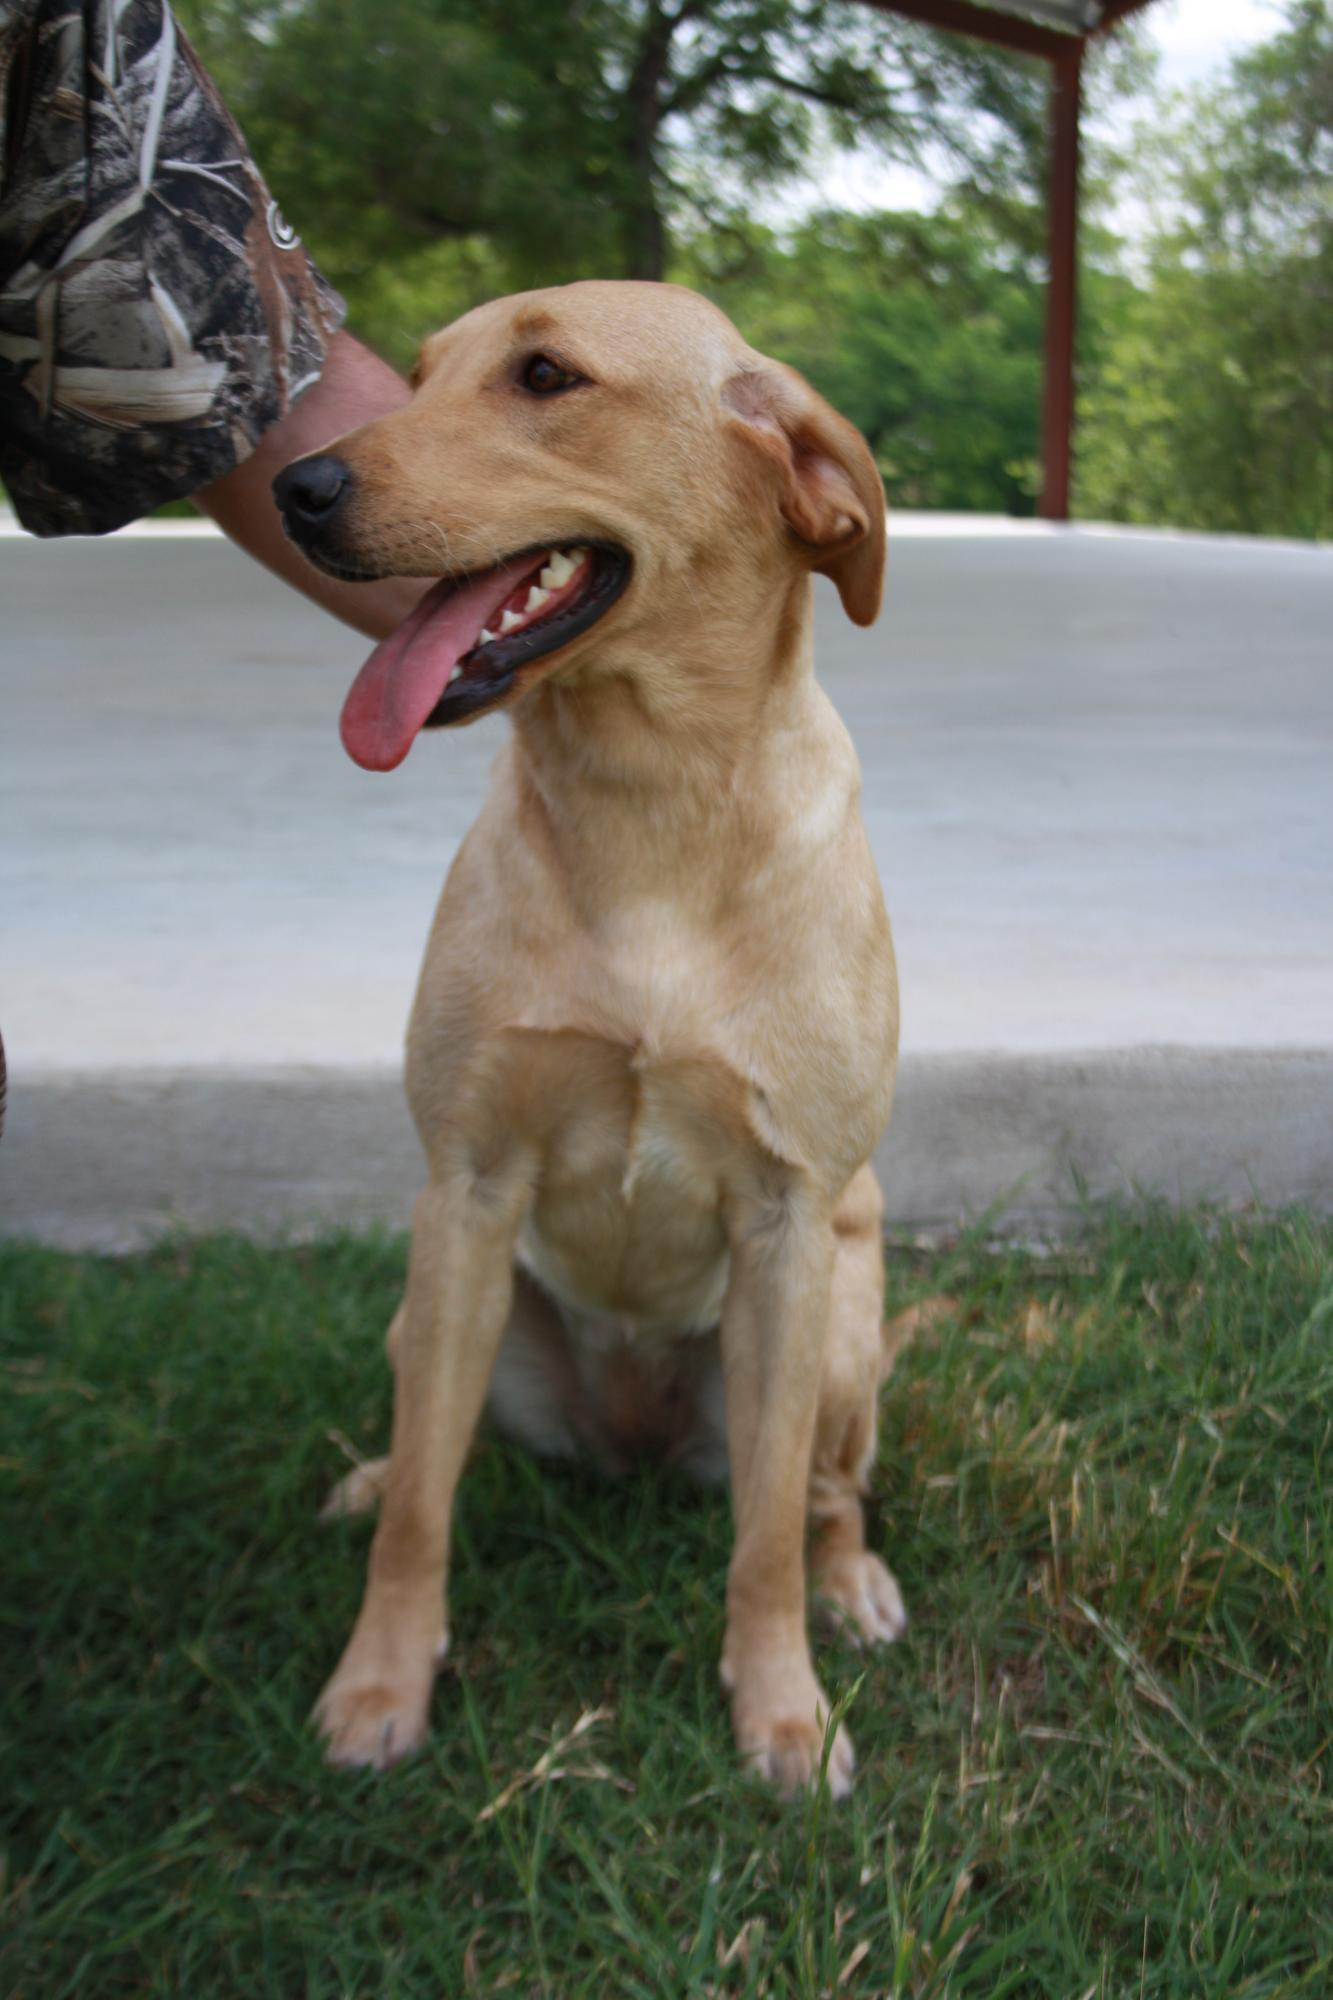 Waterstone Labradors - Boerne, TX 78006 - (210)305-1293 | ShowMeLocal.com